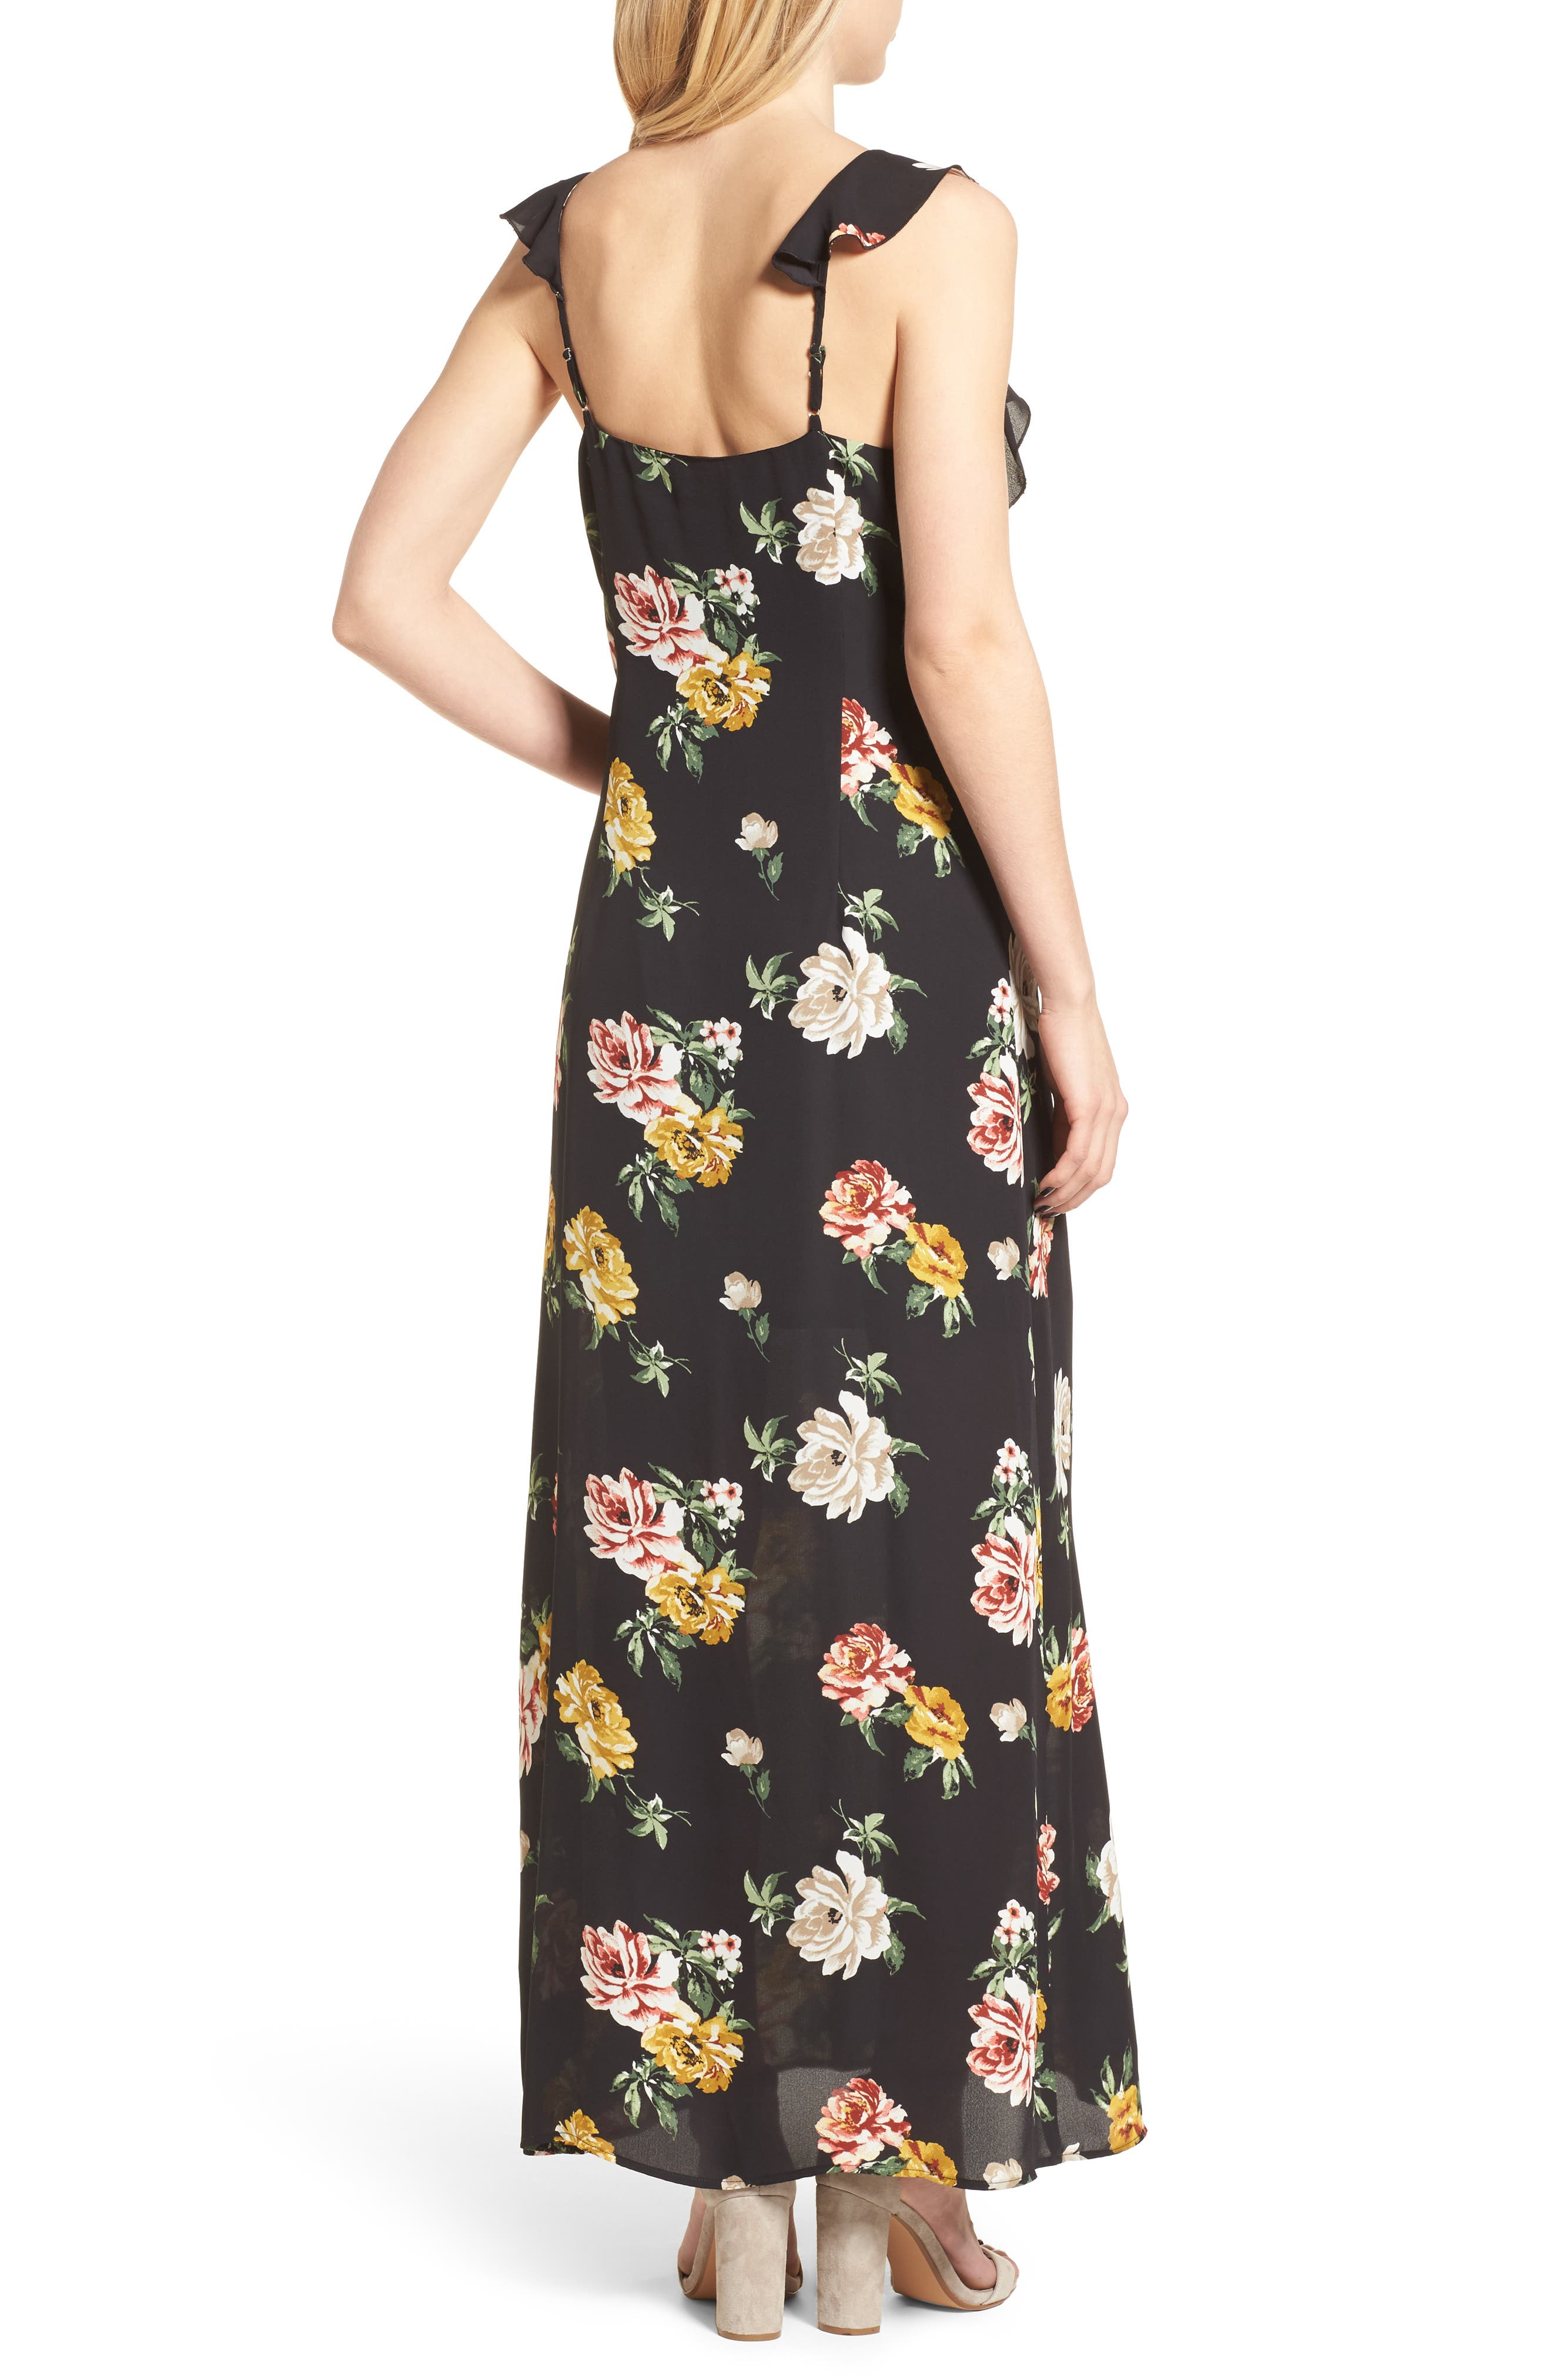 Floral Ruffle Strap Maxi Dress,                             Alternate thumbnail 2, color,                             Black Large Floral Print